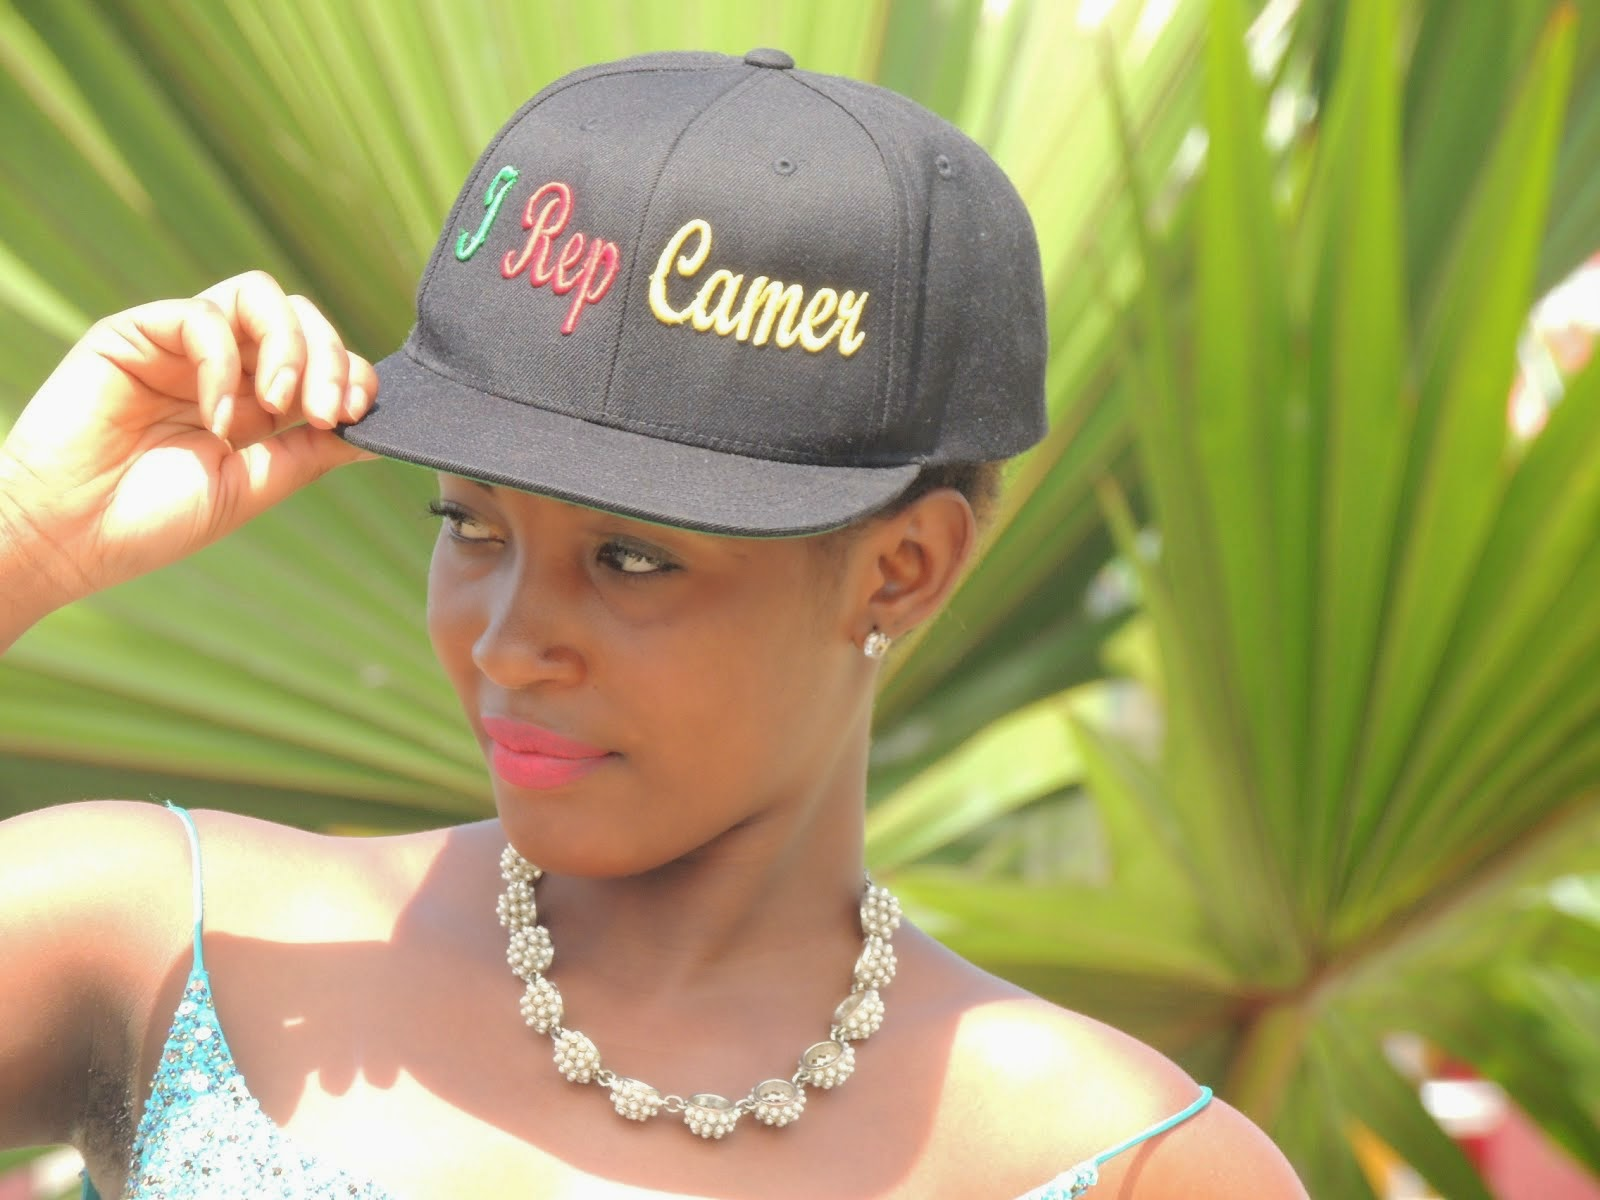 IRepCamer Muse Tokee Lala